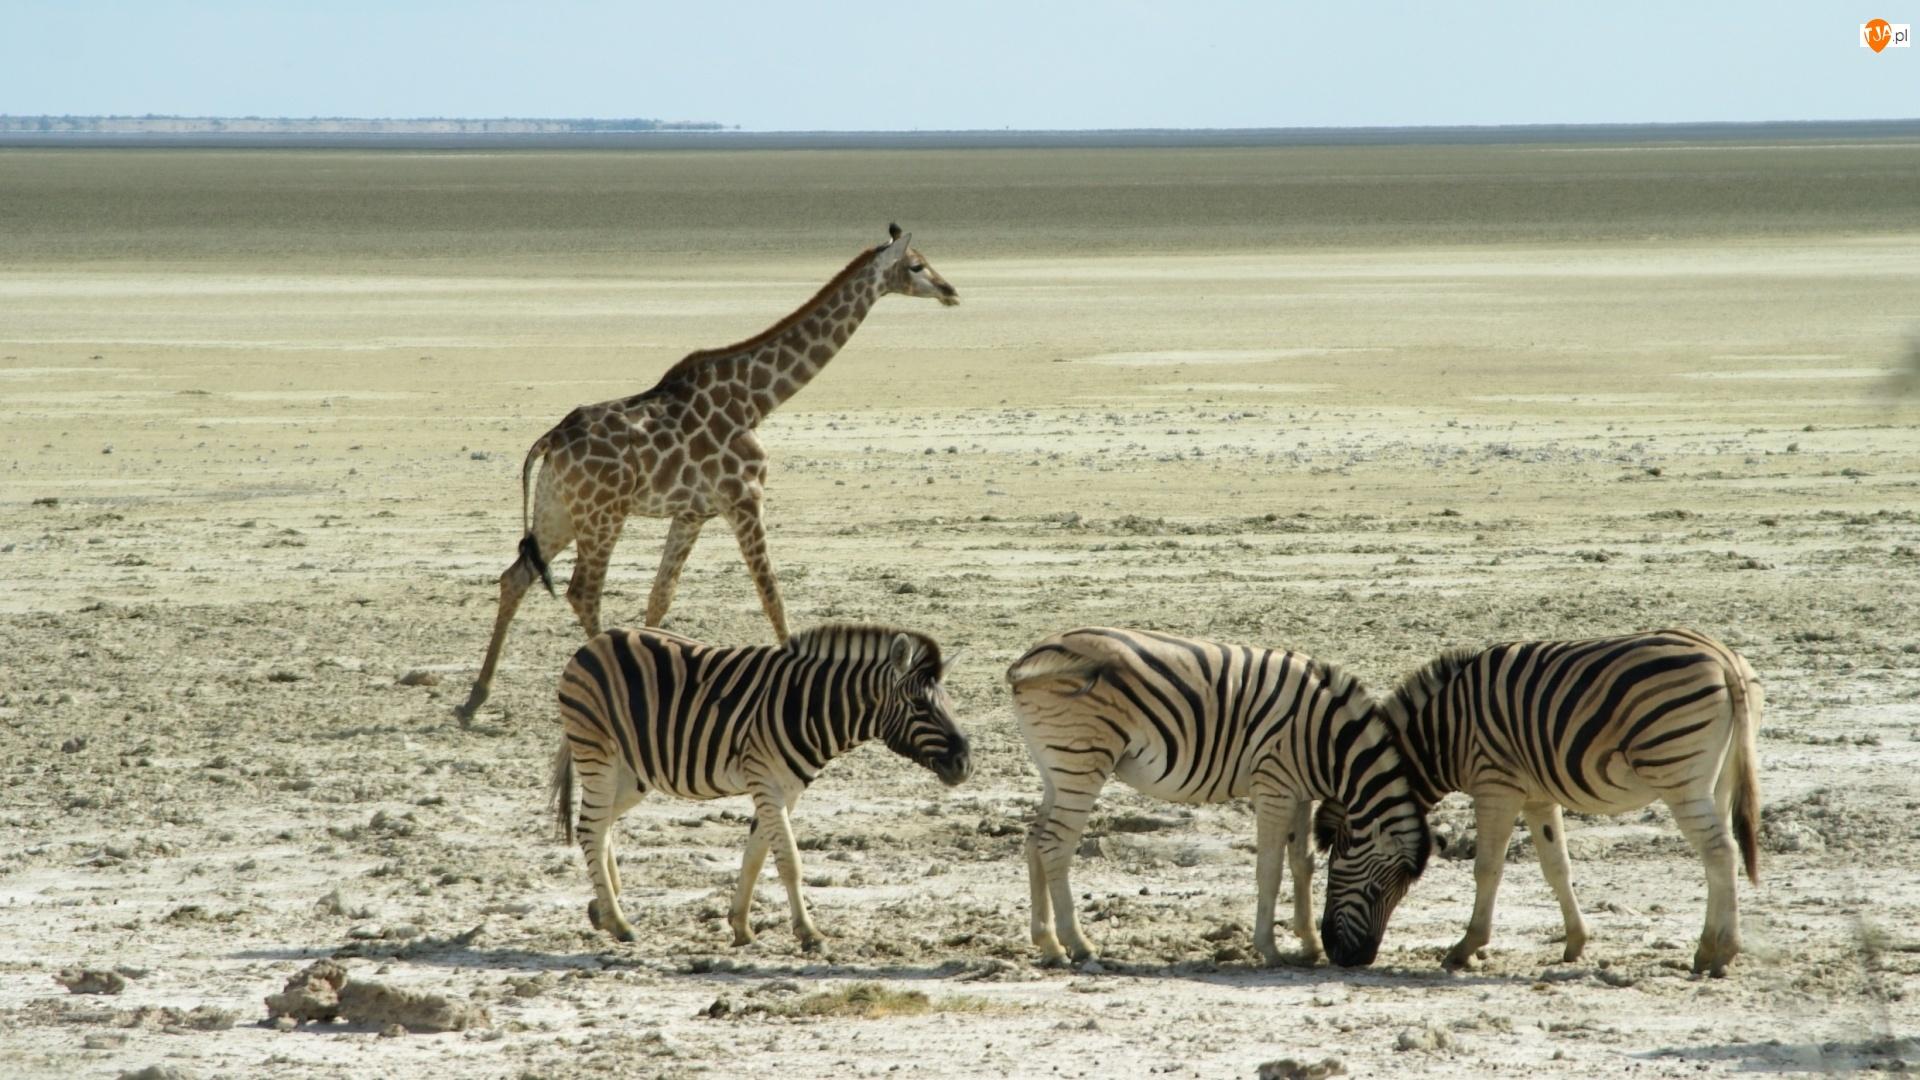 Zebry, Afryka, Żyrafa, Sawanna